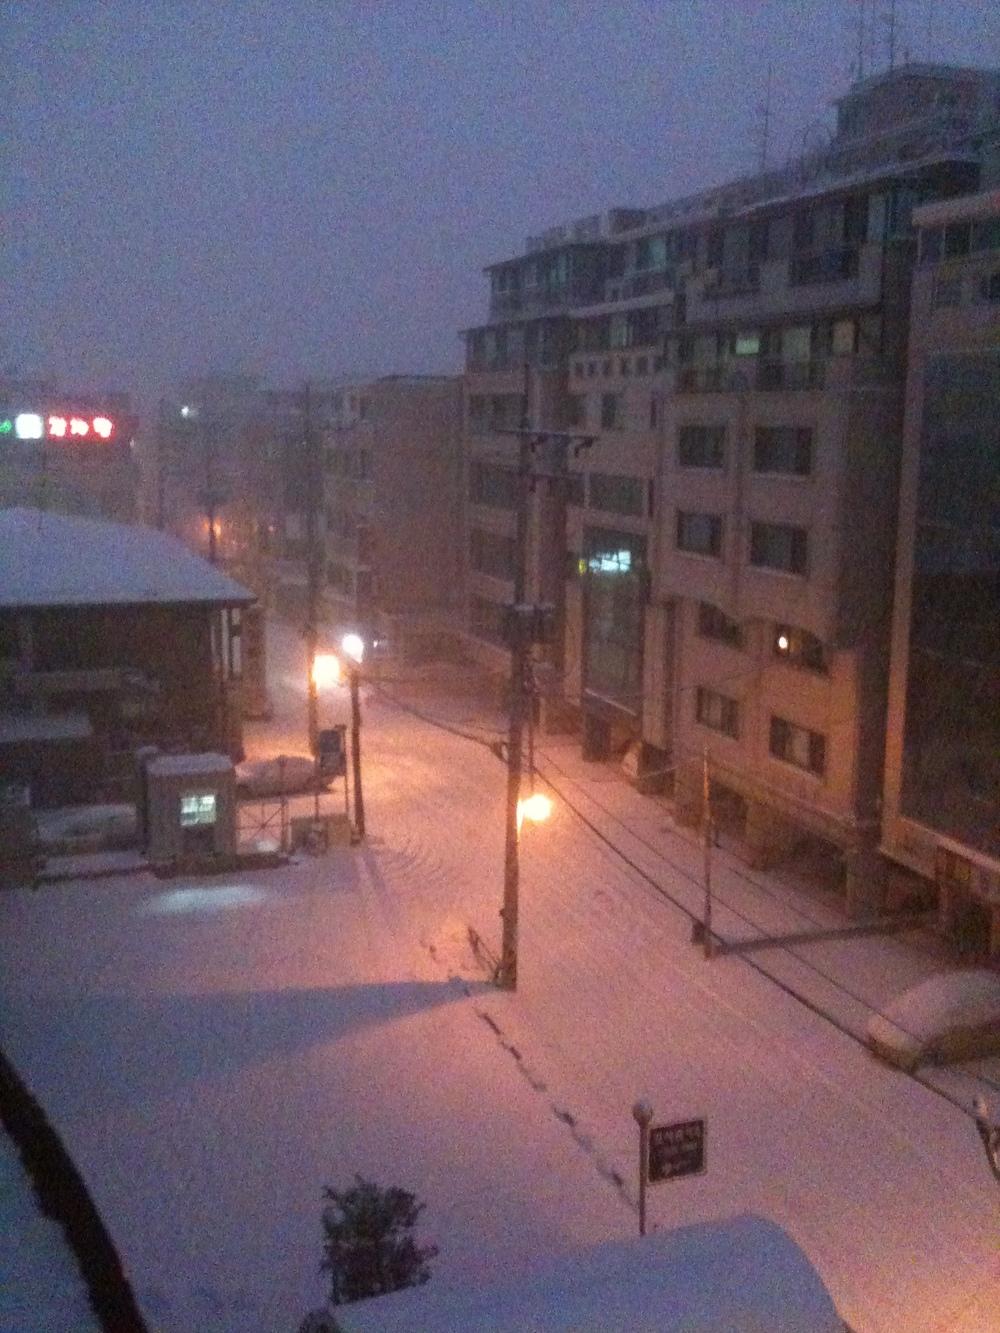 Snow falling again in Seoul